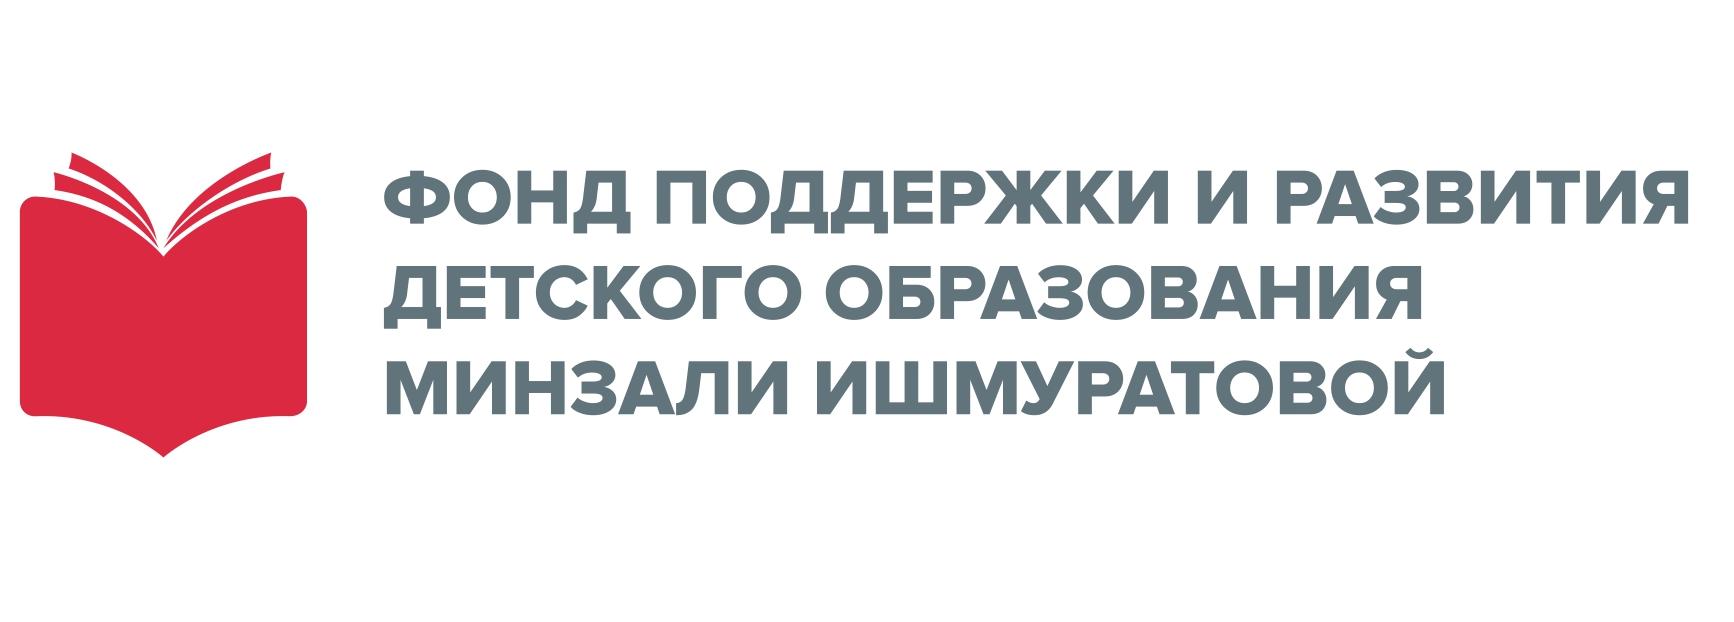 photoeditorsdk-export (8)